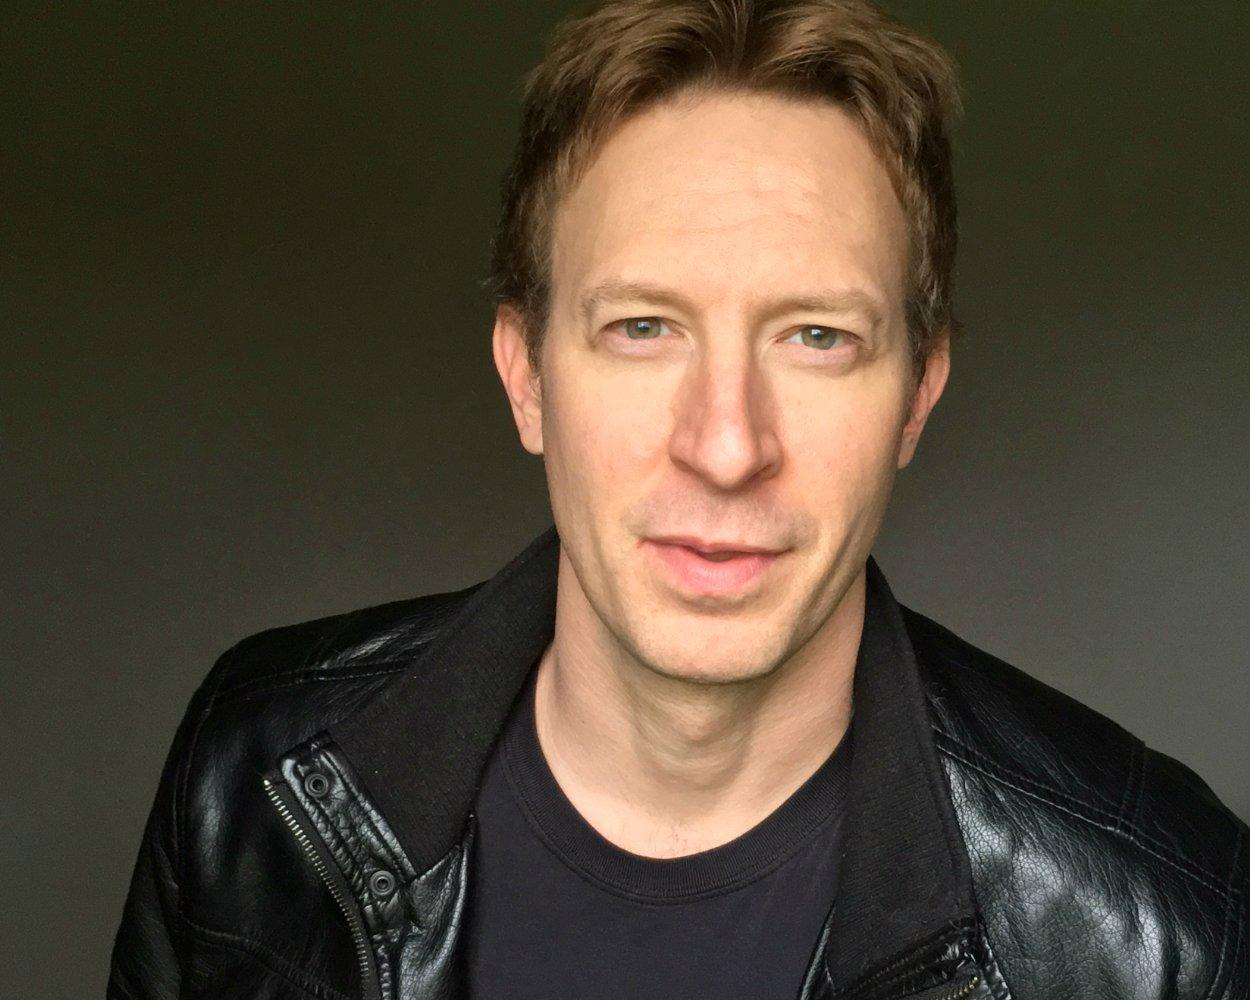 Joshua Gibbons